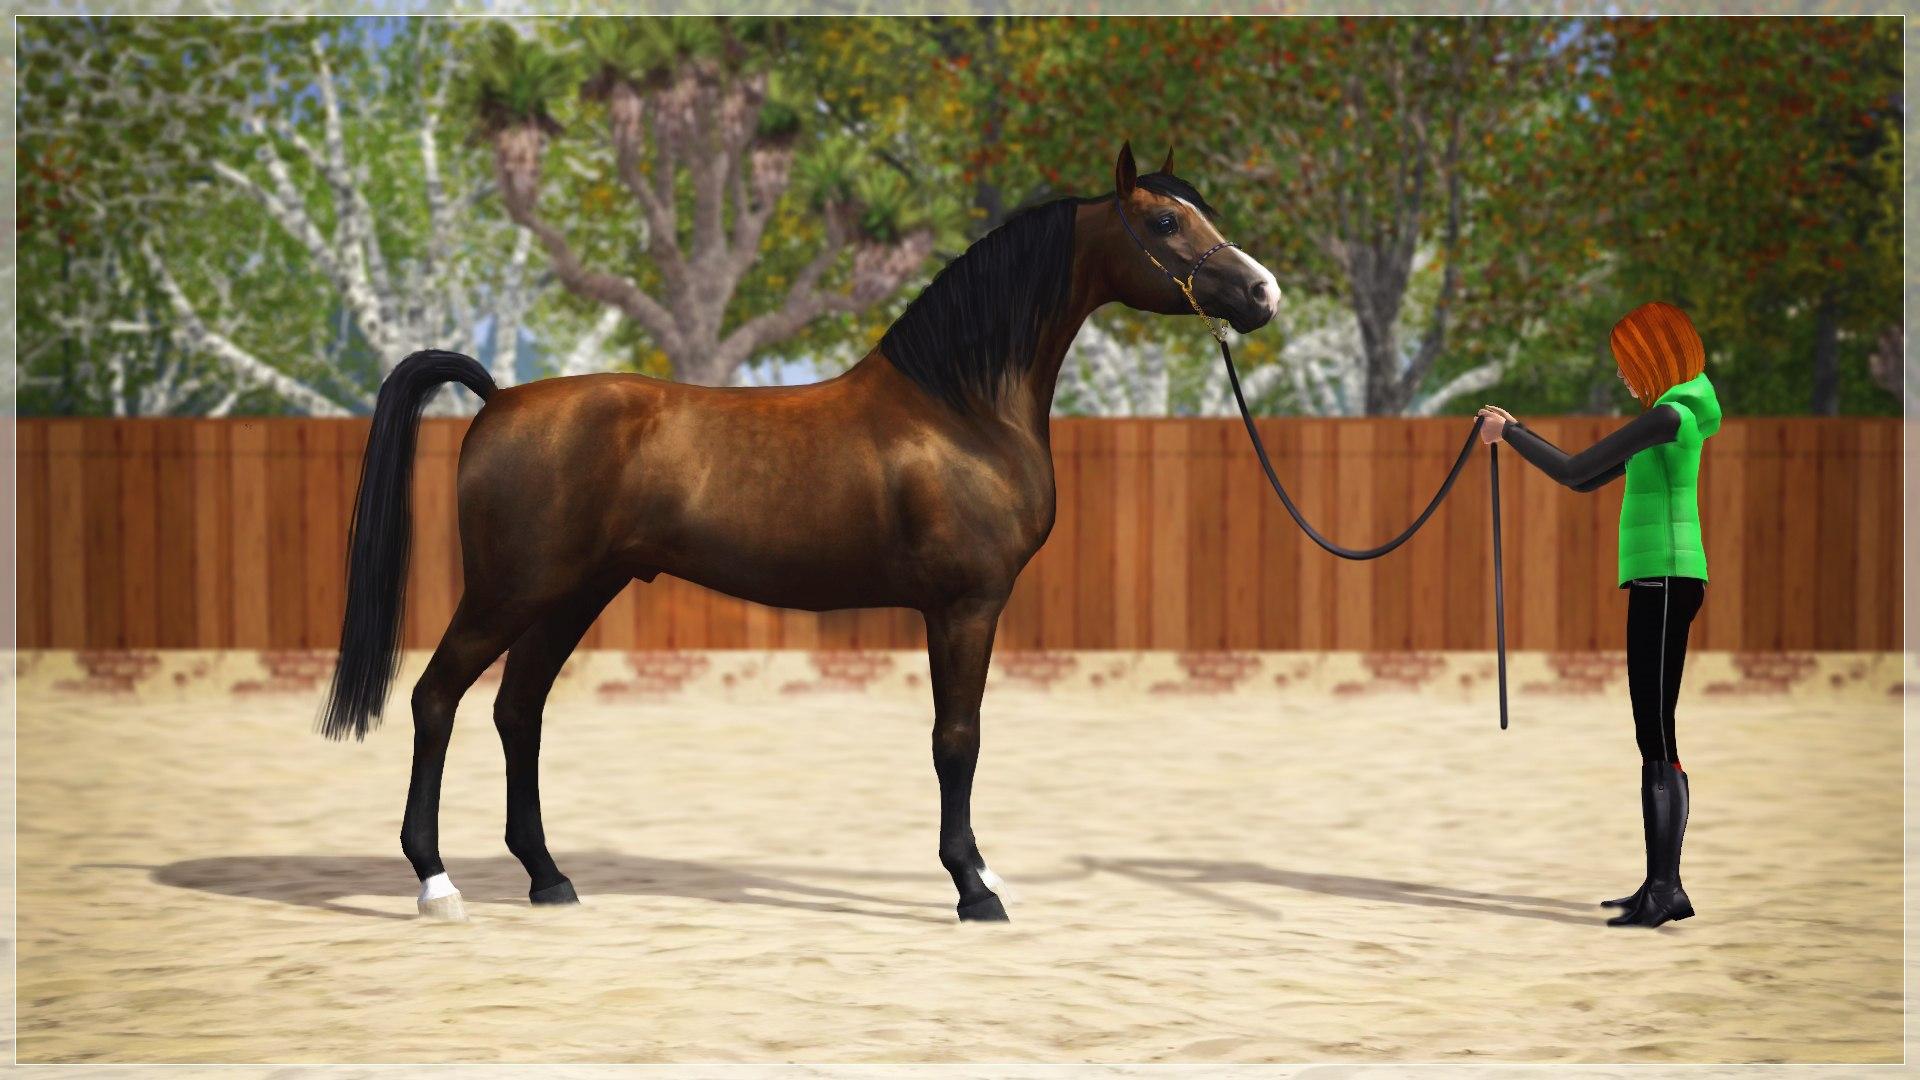 Регистрация лошадей в RHF 2 - Страница 7 R4lCADaJVKs